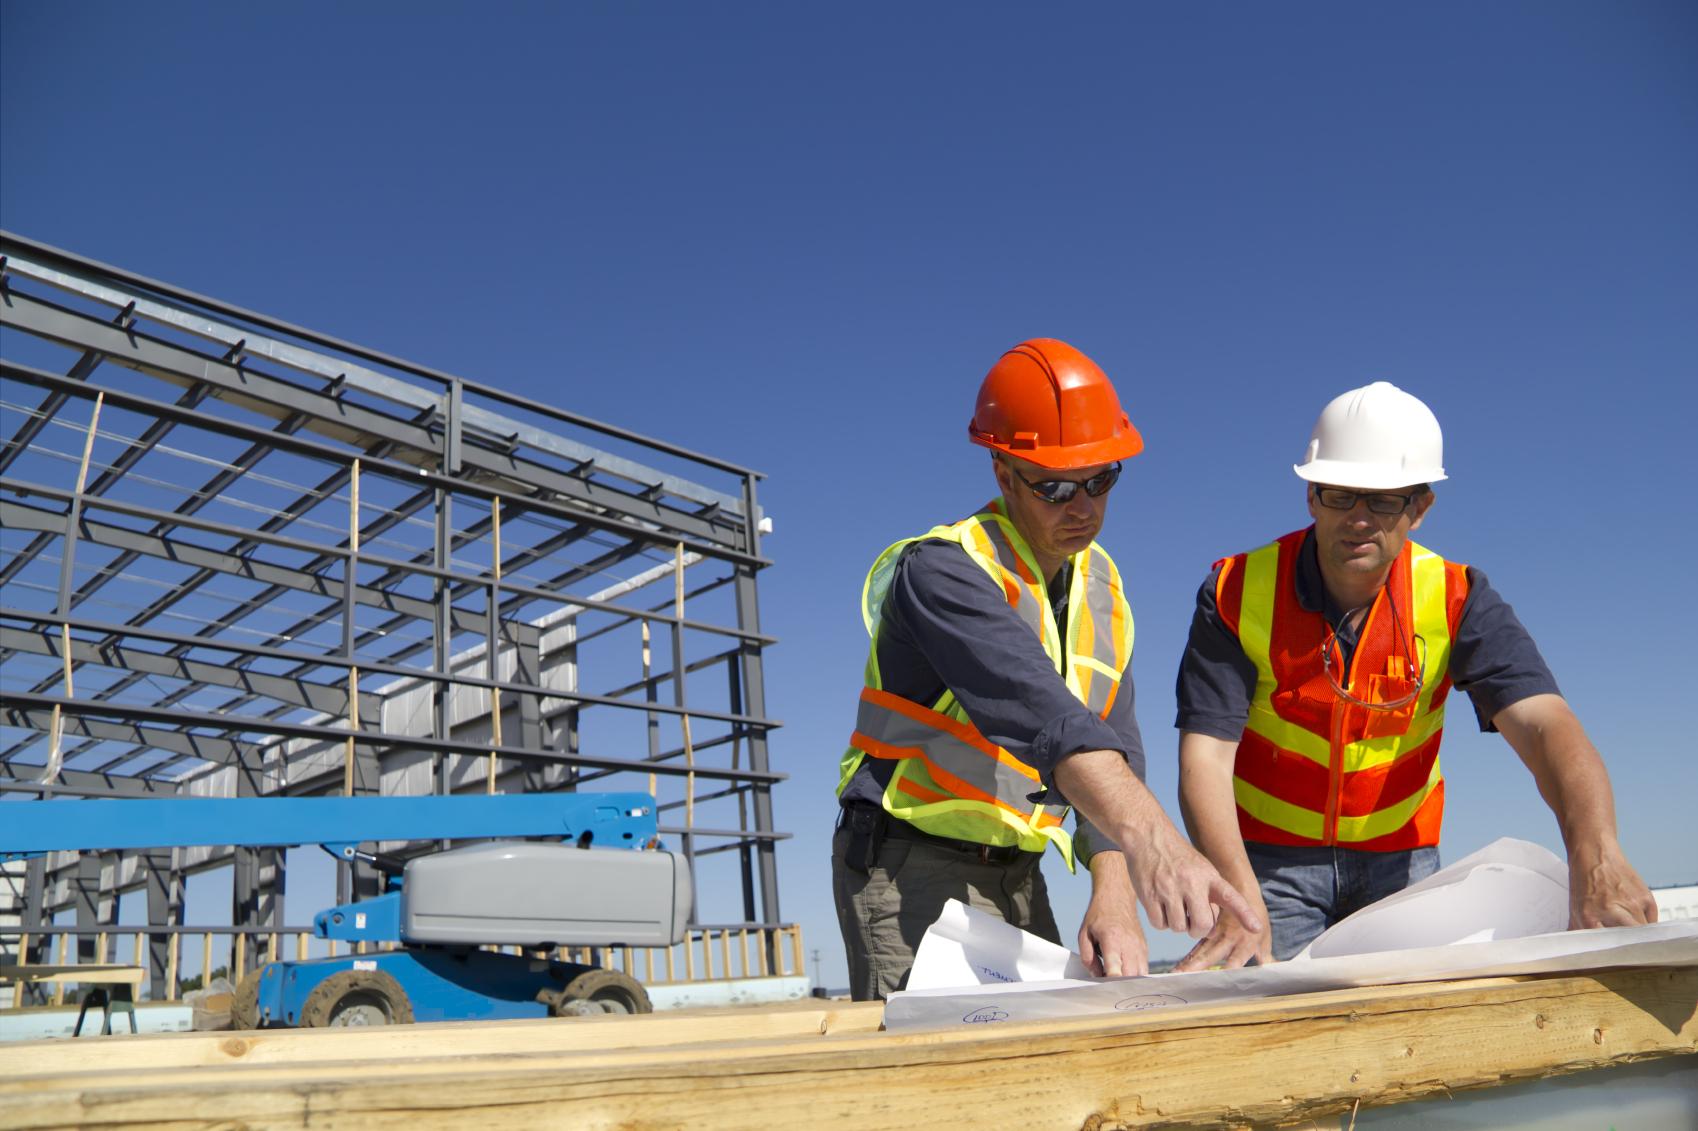 Alberta Works Job Fair in Edmonton May 17th